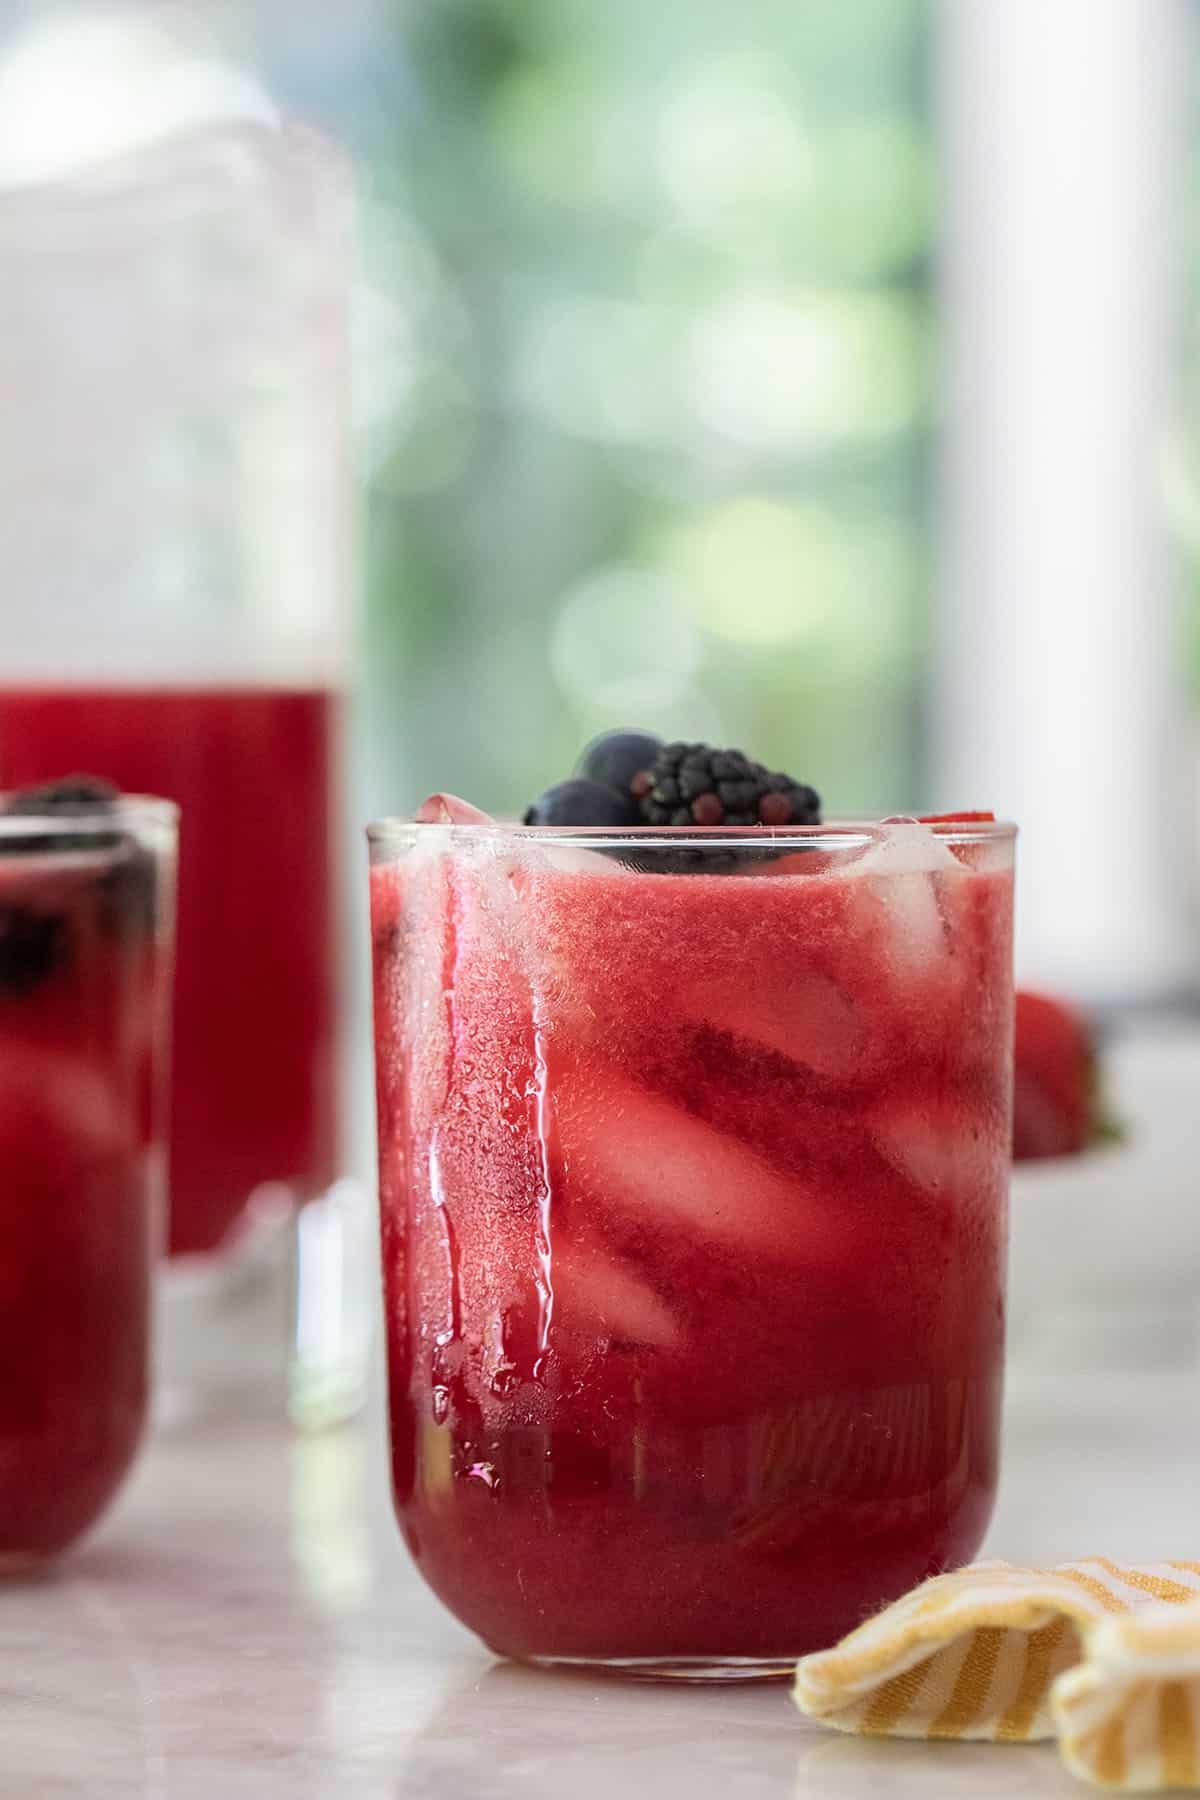 Iced berry lemonade recipe with blackberries, strawberries and blueberries.